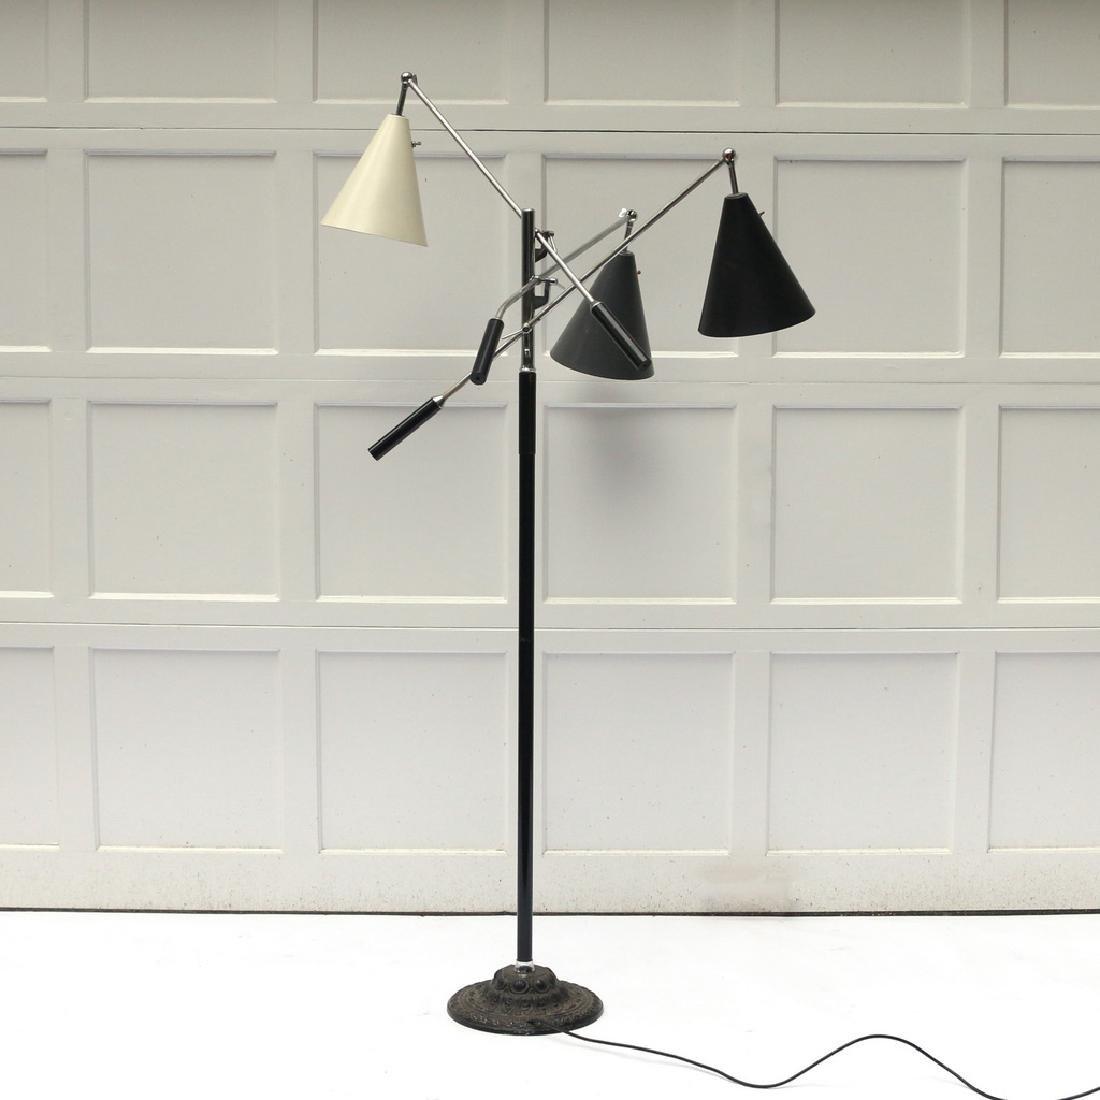 GINO SARFATTI TRIENNALE FLOOR LAMP - 3